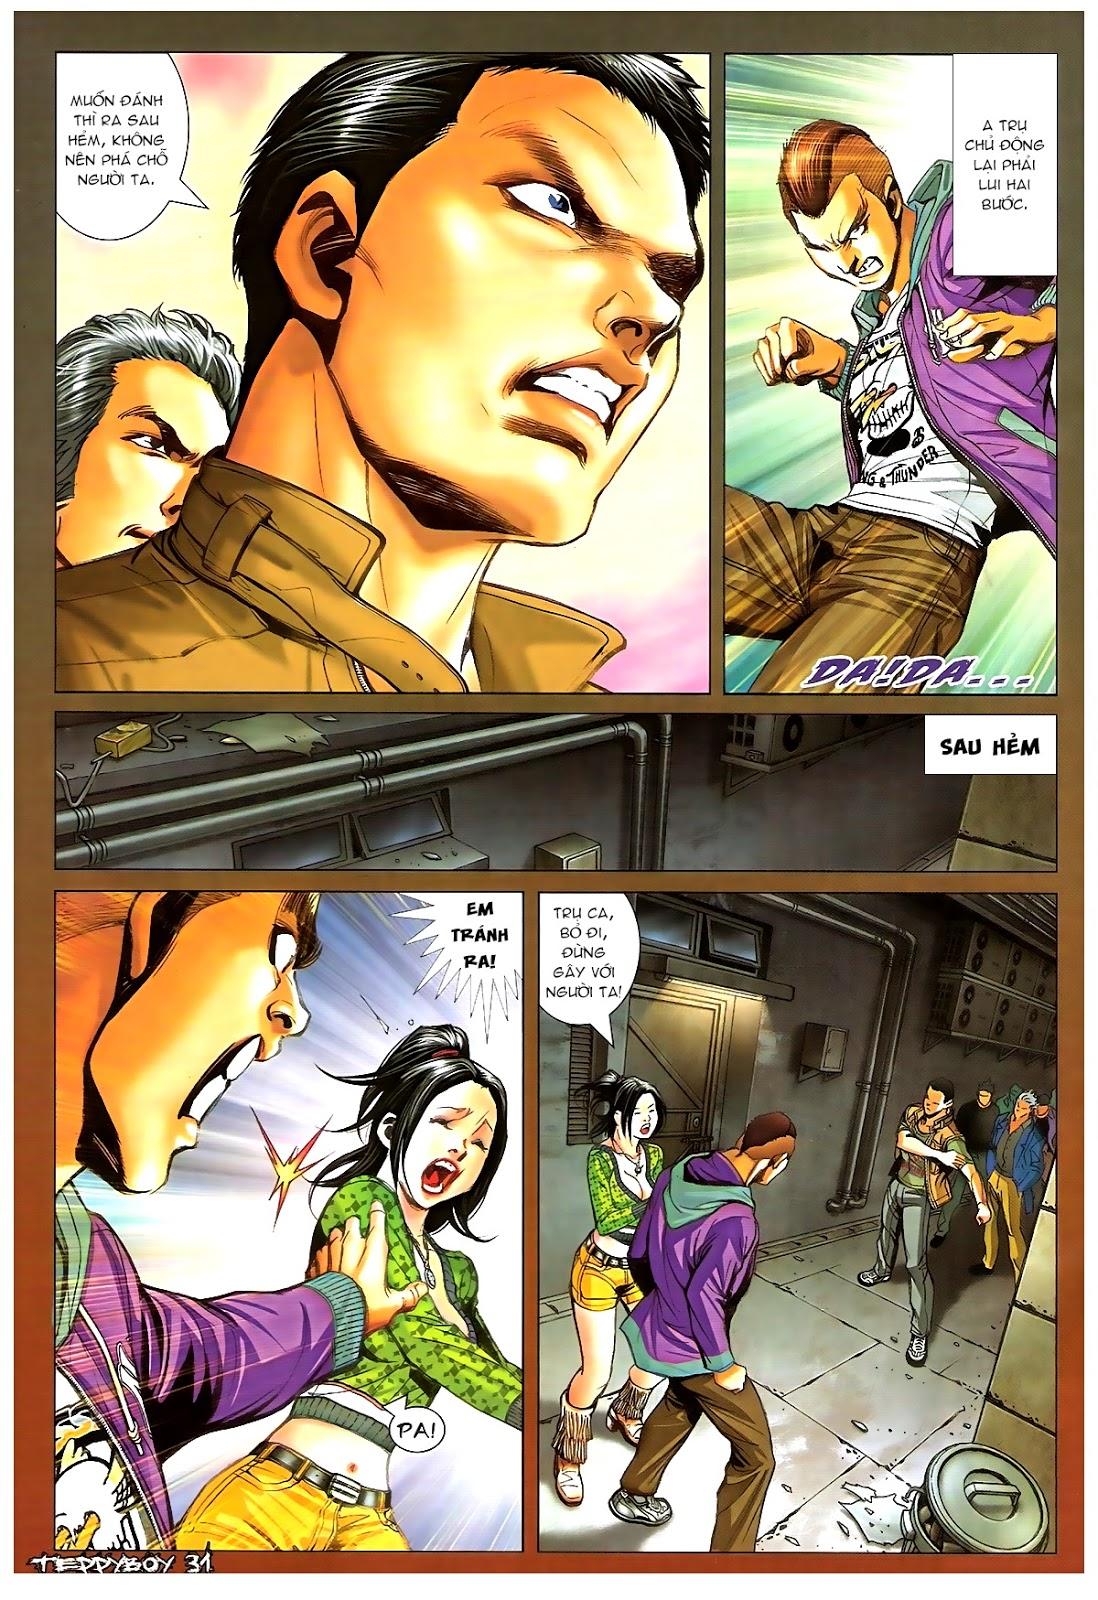 Người Trong Giang Hồ - Chapter 1379: Oan gia gặp nhau - Pic 27